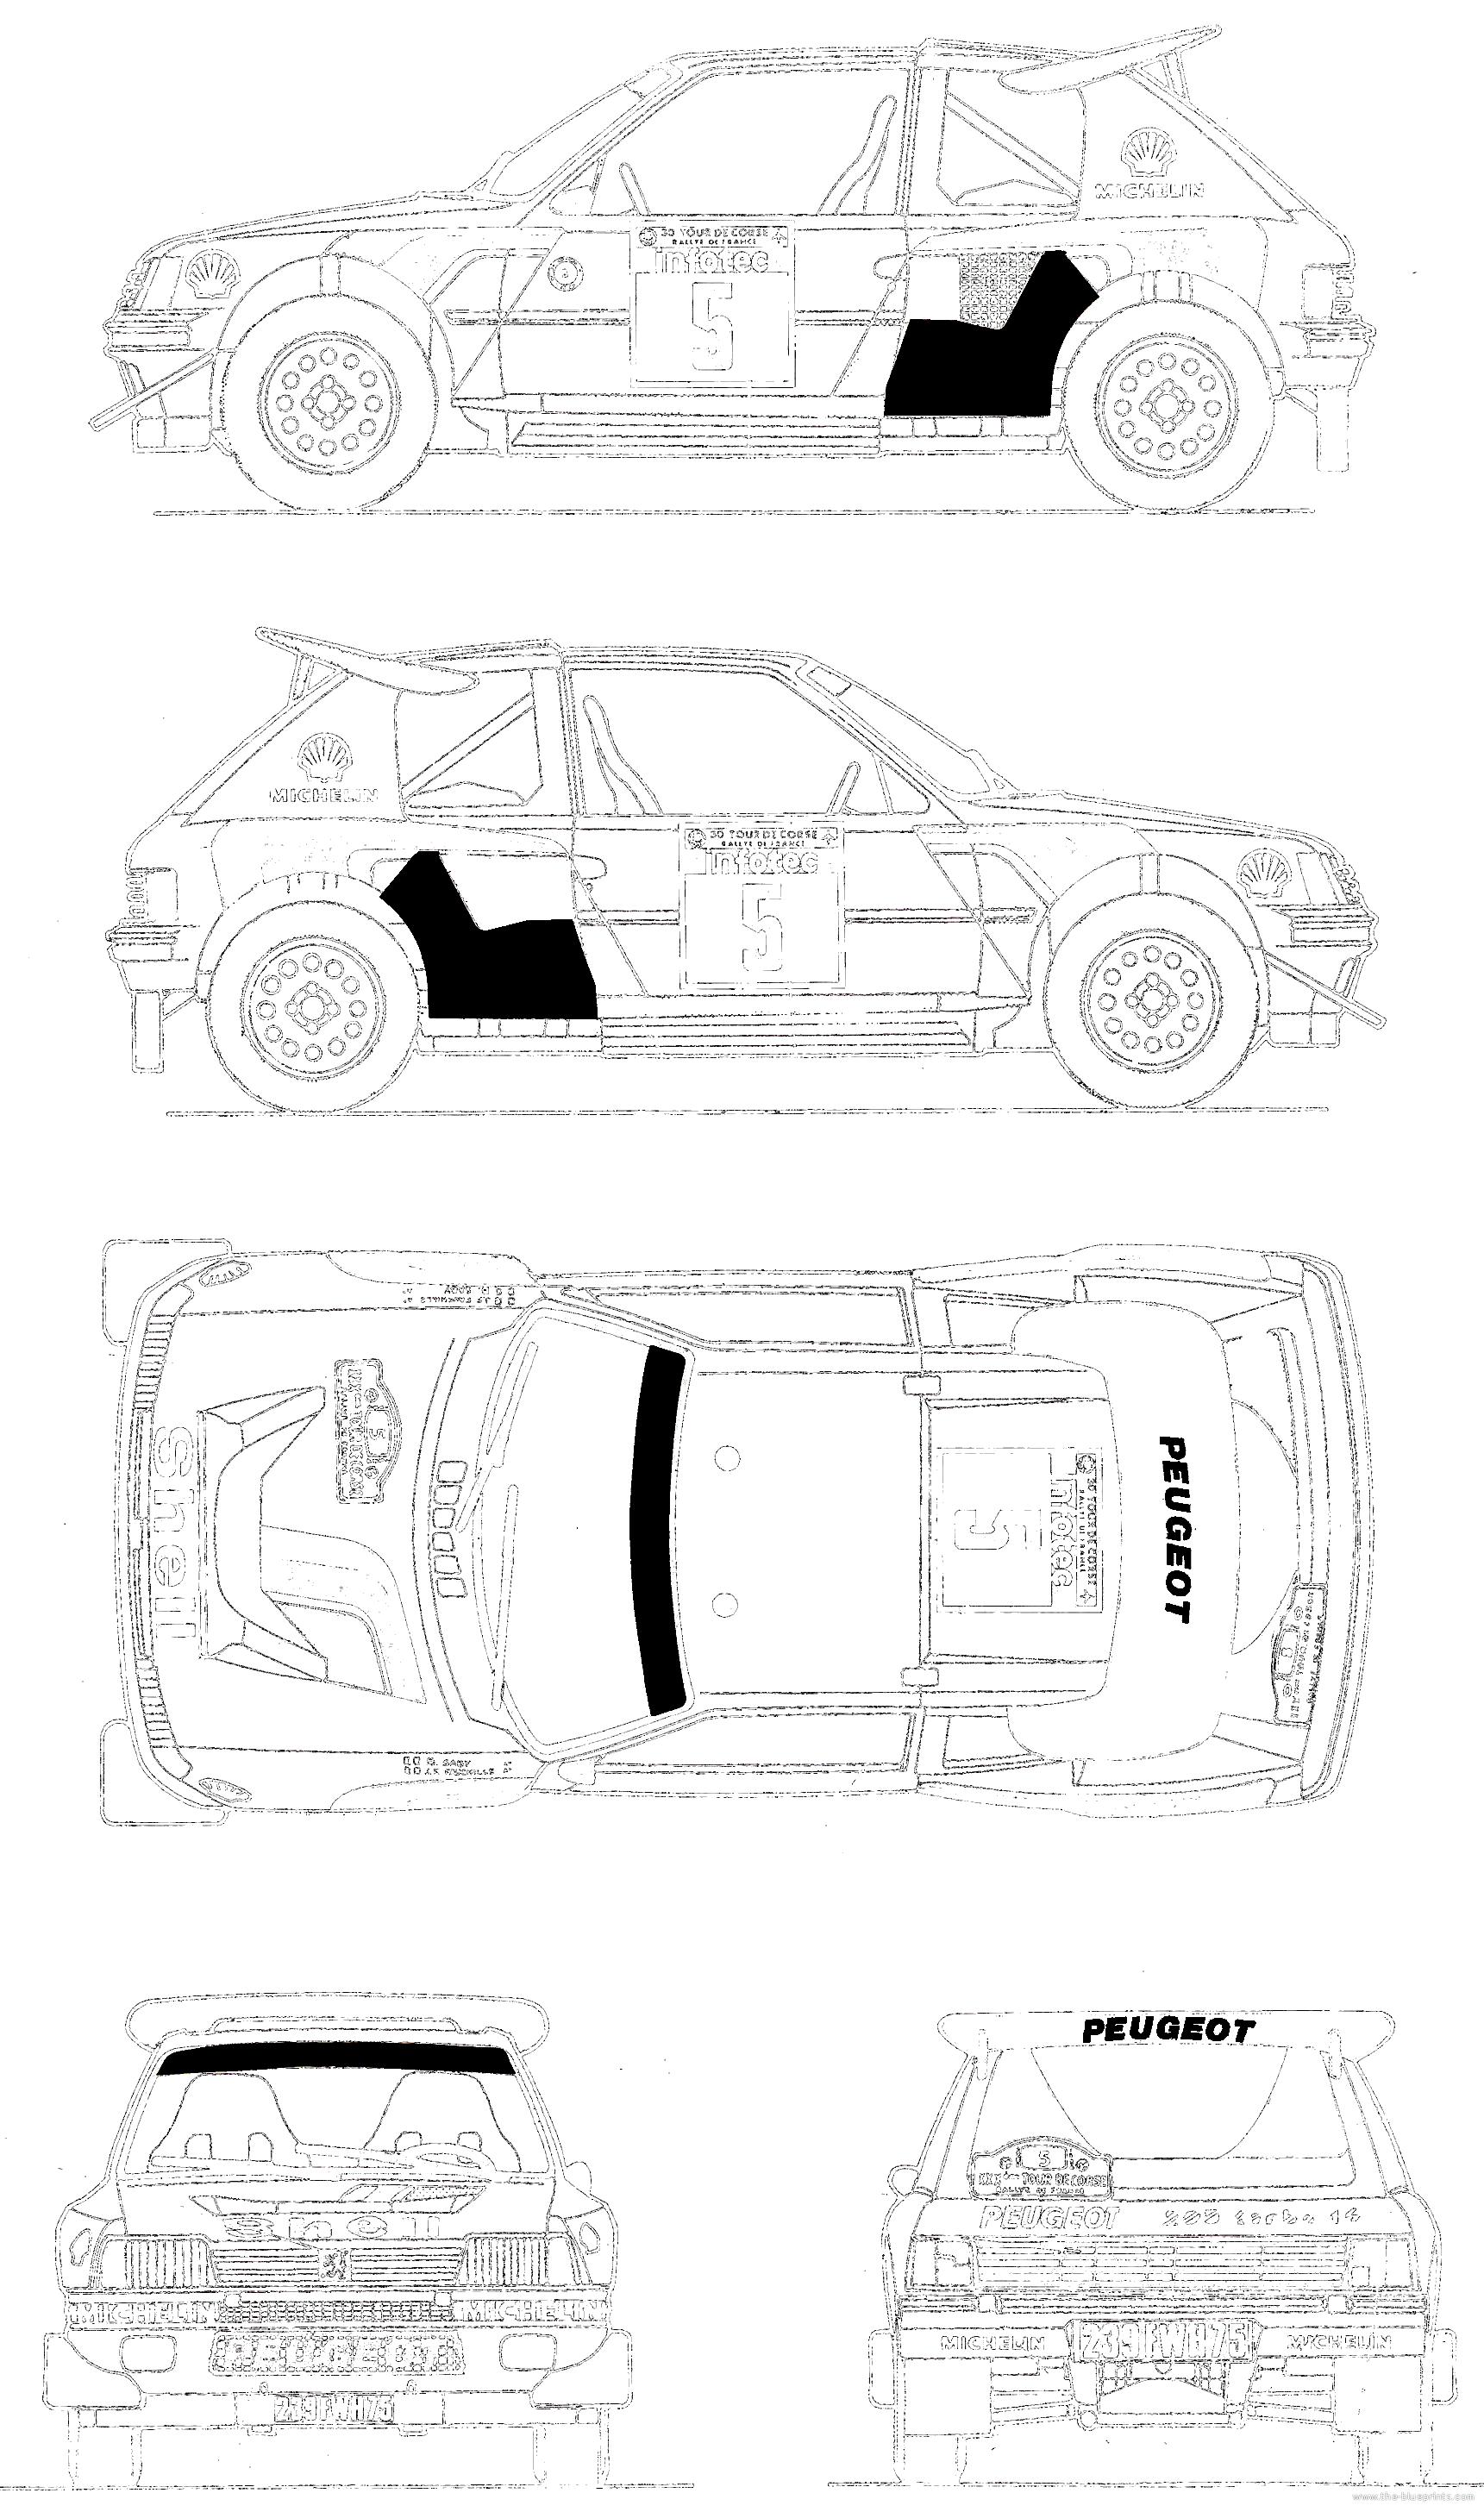 blueprints  u0026gt  cars  u0026gt  peugeot  u0026gt  peugeot 205 turbo 16  1985